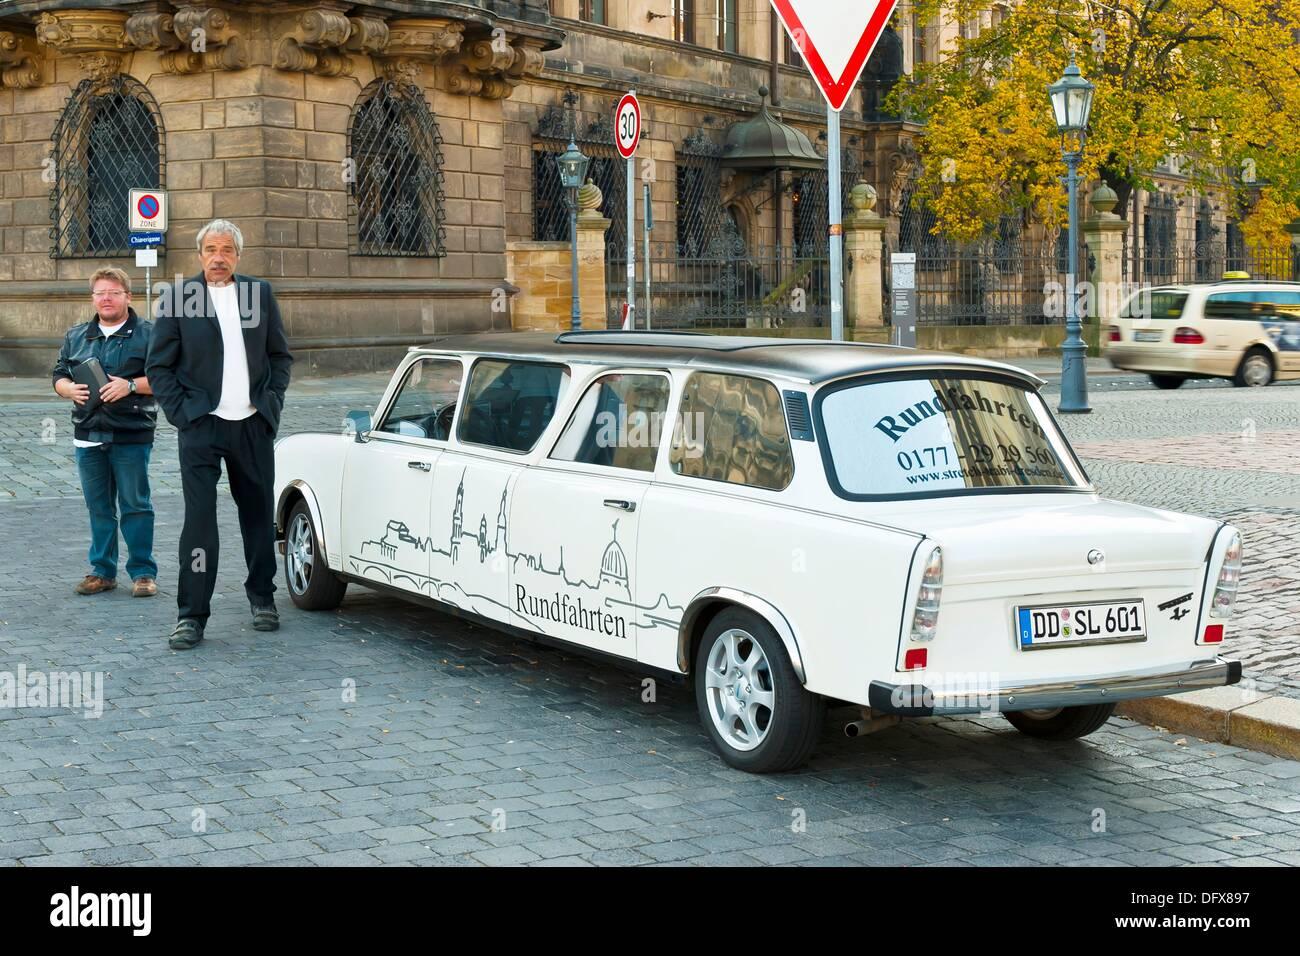 Trabi Limousine, Theaterplatz, Dresden, Saxony, Germany - Stock Image